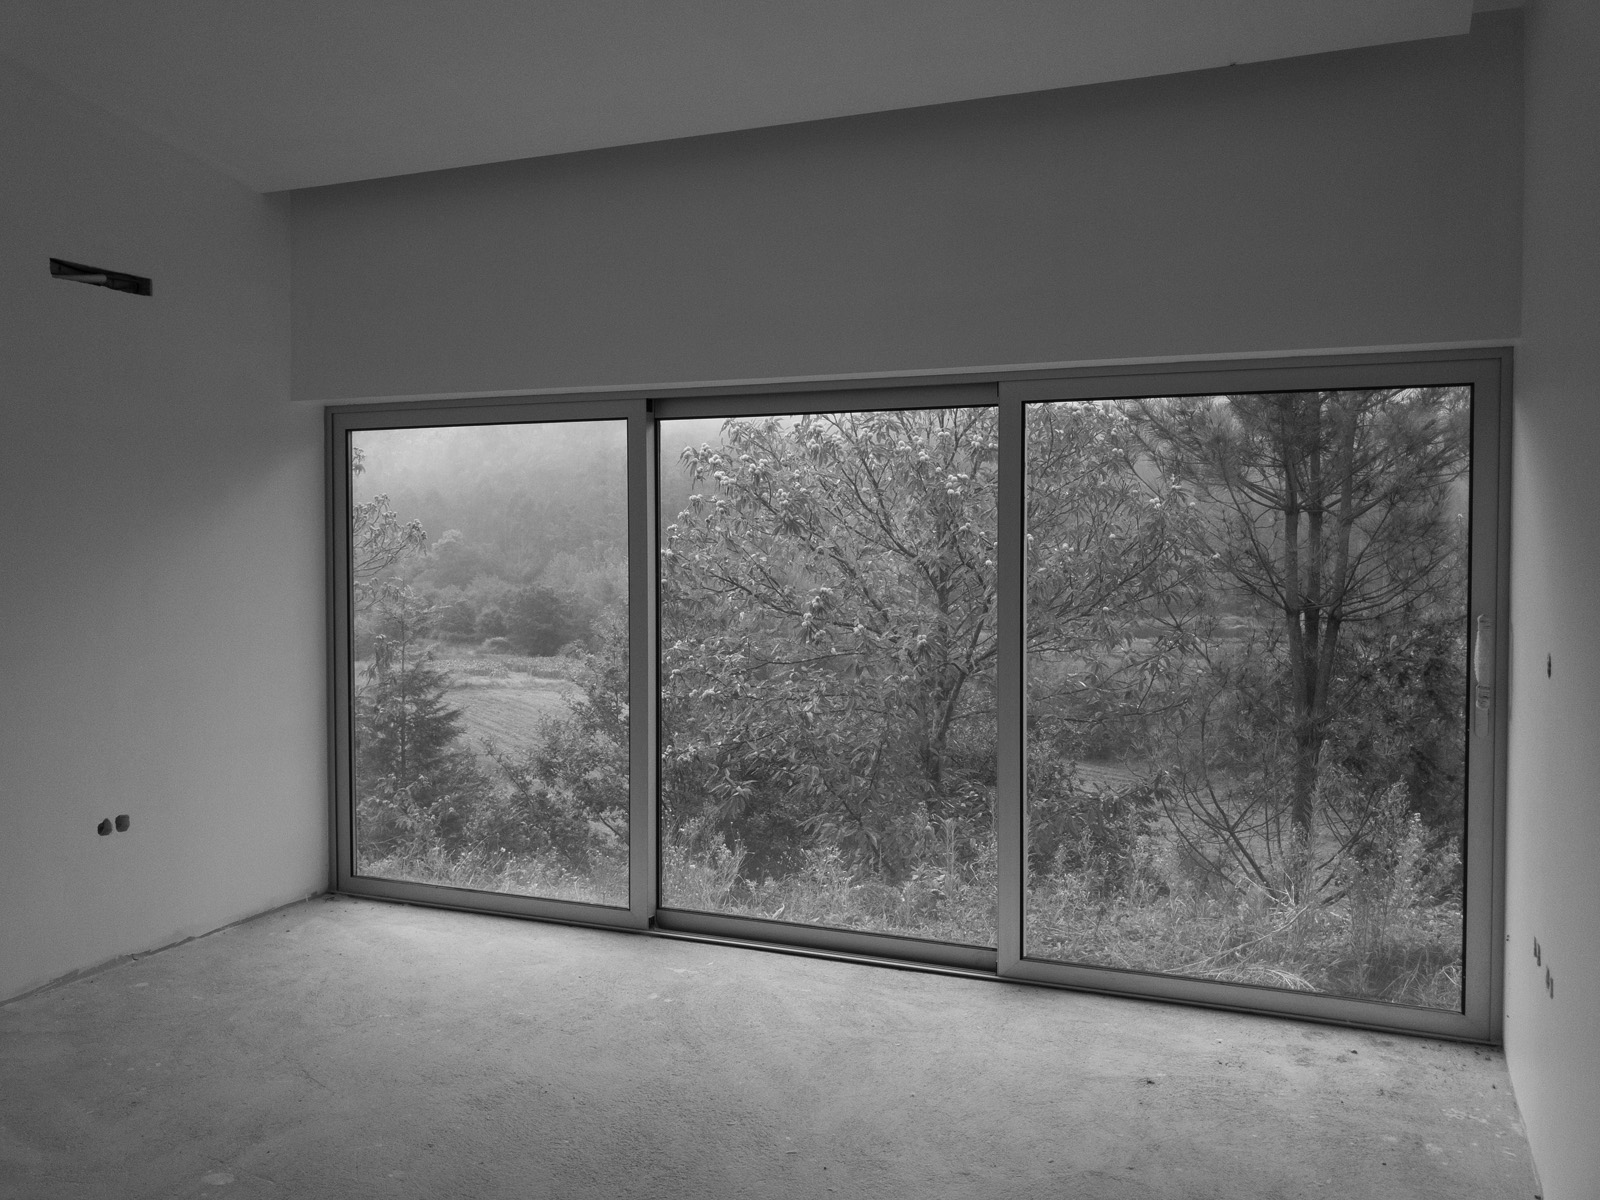 Moradia S+N - arquitectura - EVA evolutionary architecture - arquitectos porto - oliveira de azemeis (15).jpg